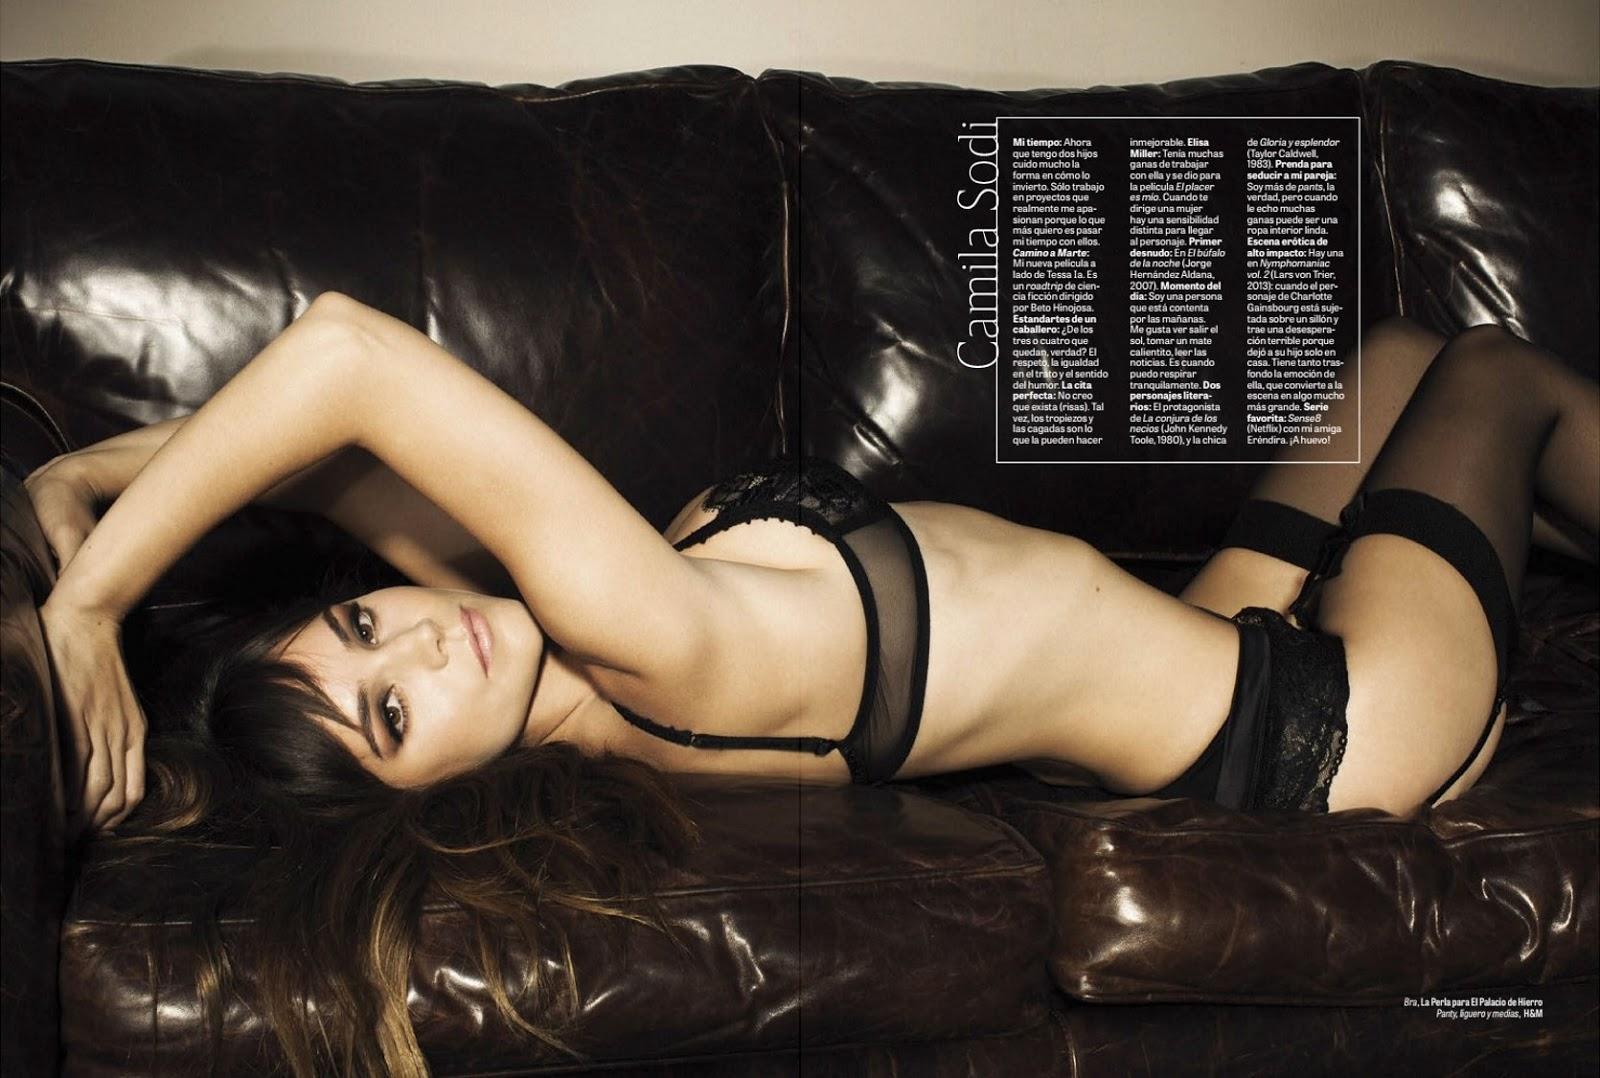 Camila Sodi Tetas camila sodi / ������ ���� - page 3 - mundo latino